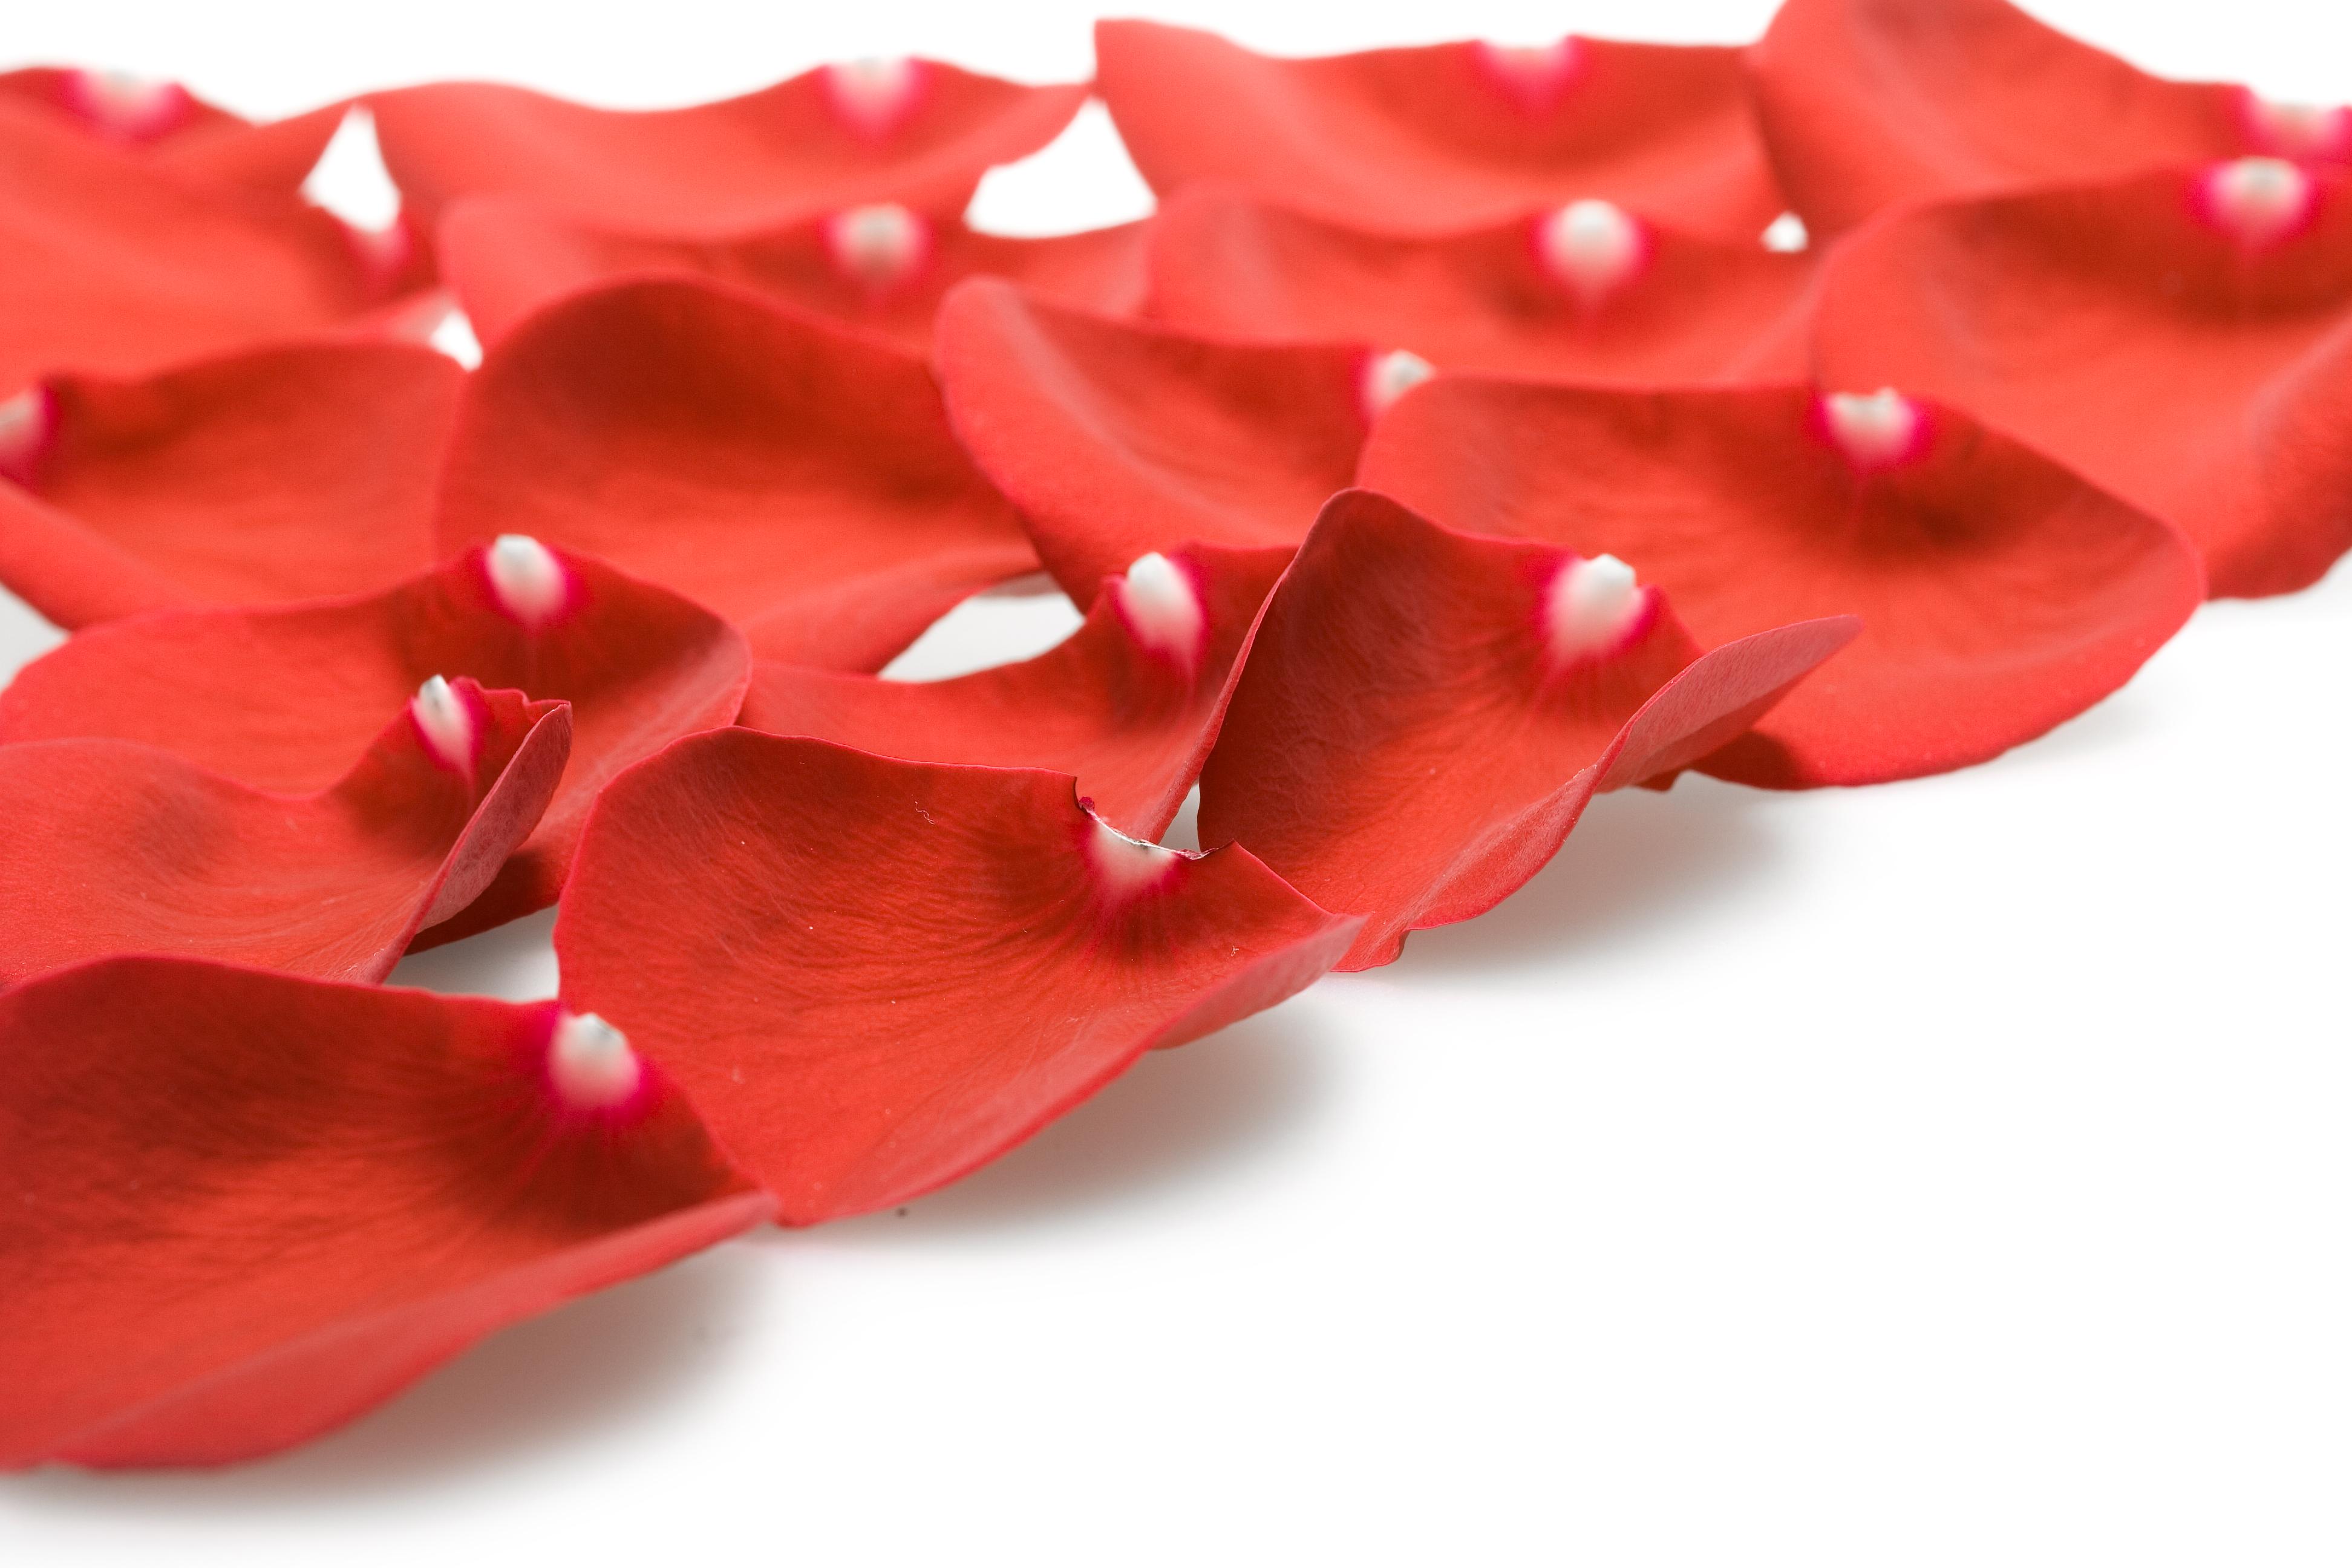 rose petals, 14, Pedal, Valentines, Valentine, HQ Photo